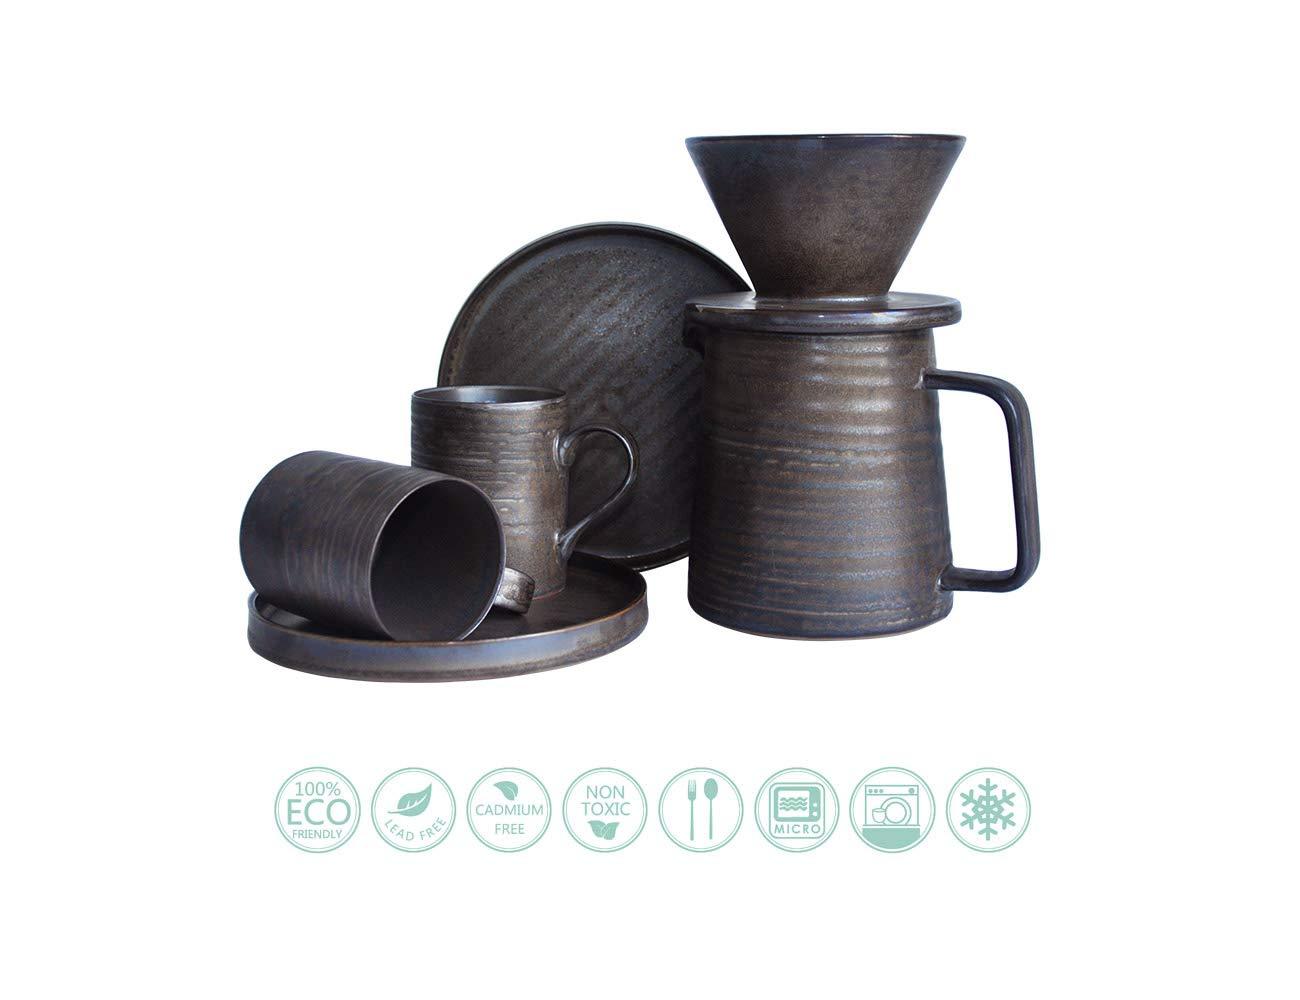 Globe Faith Eco-friendly Coffee Gift, Pour Over Coffee Maker Espresso Coffee Set, Pour Over Coffee Brewer Drip, Coffee Percolator, Coffee Pot and Cup Maker, Retro Annular Texture Metallic Glaze, Black